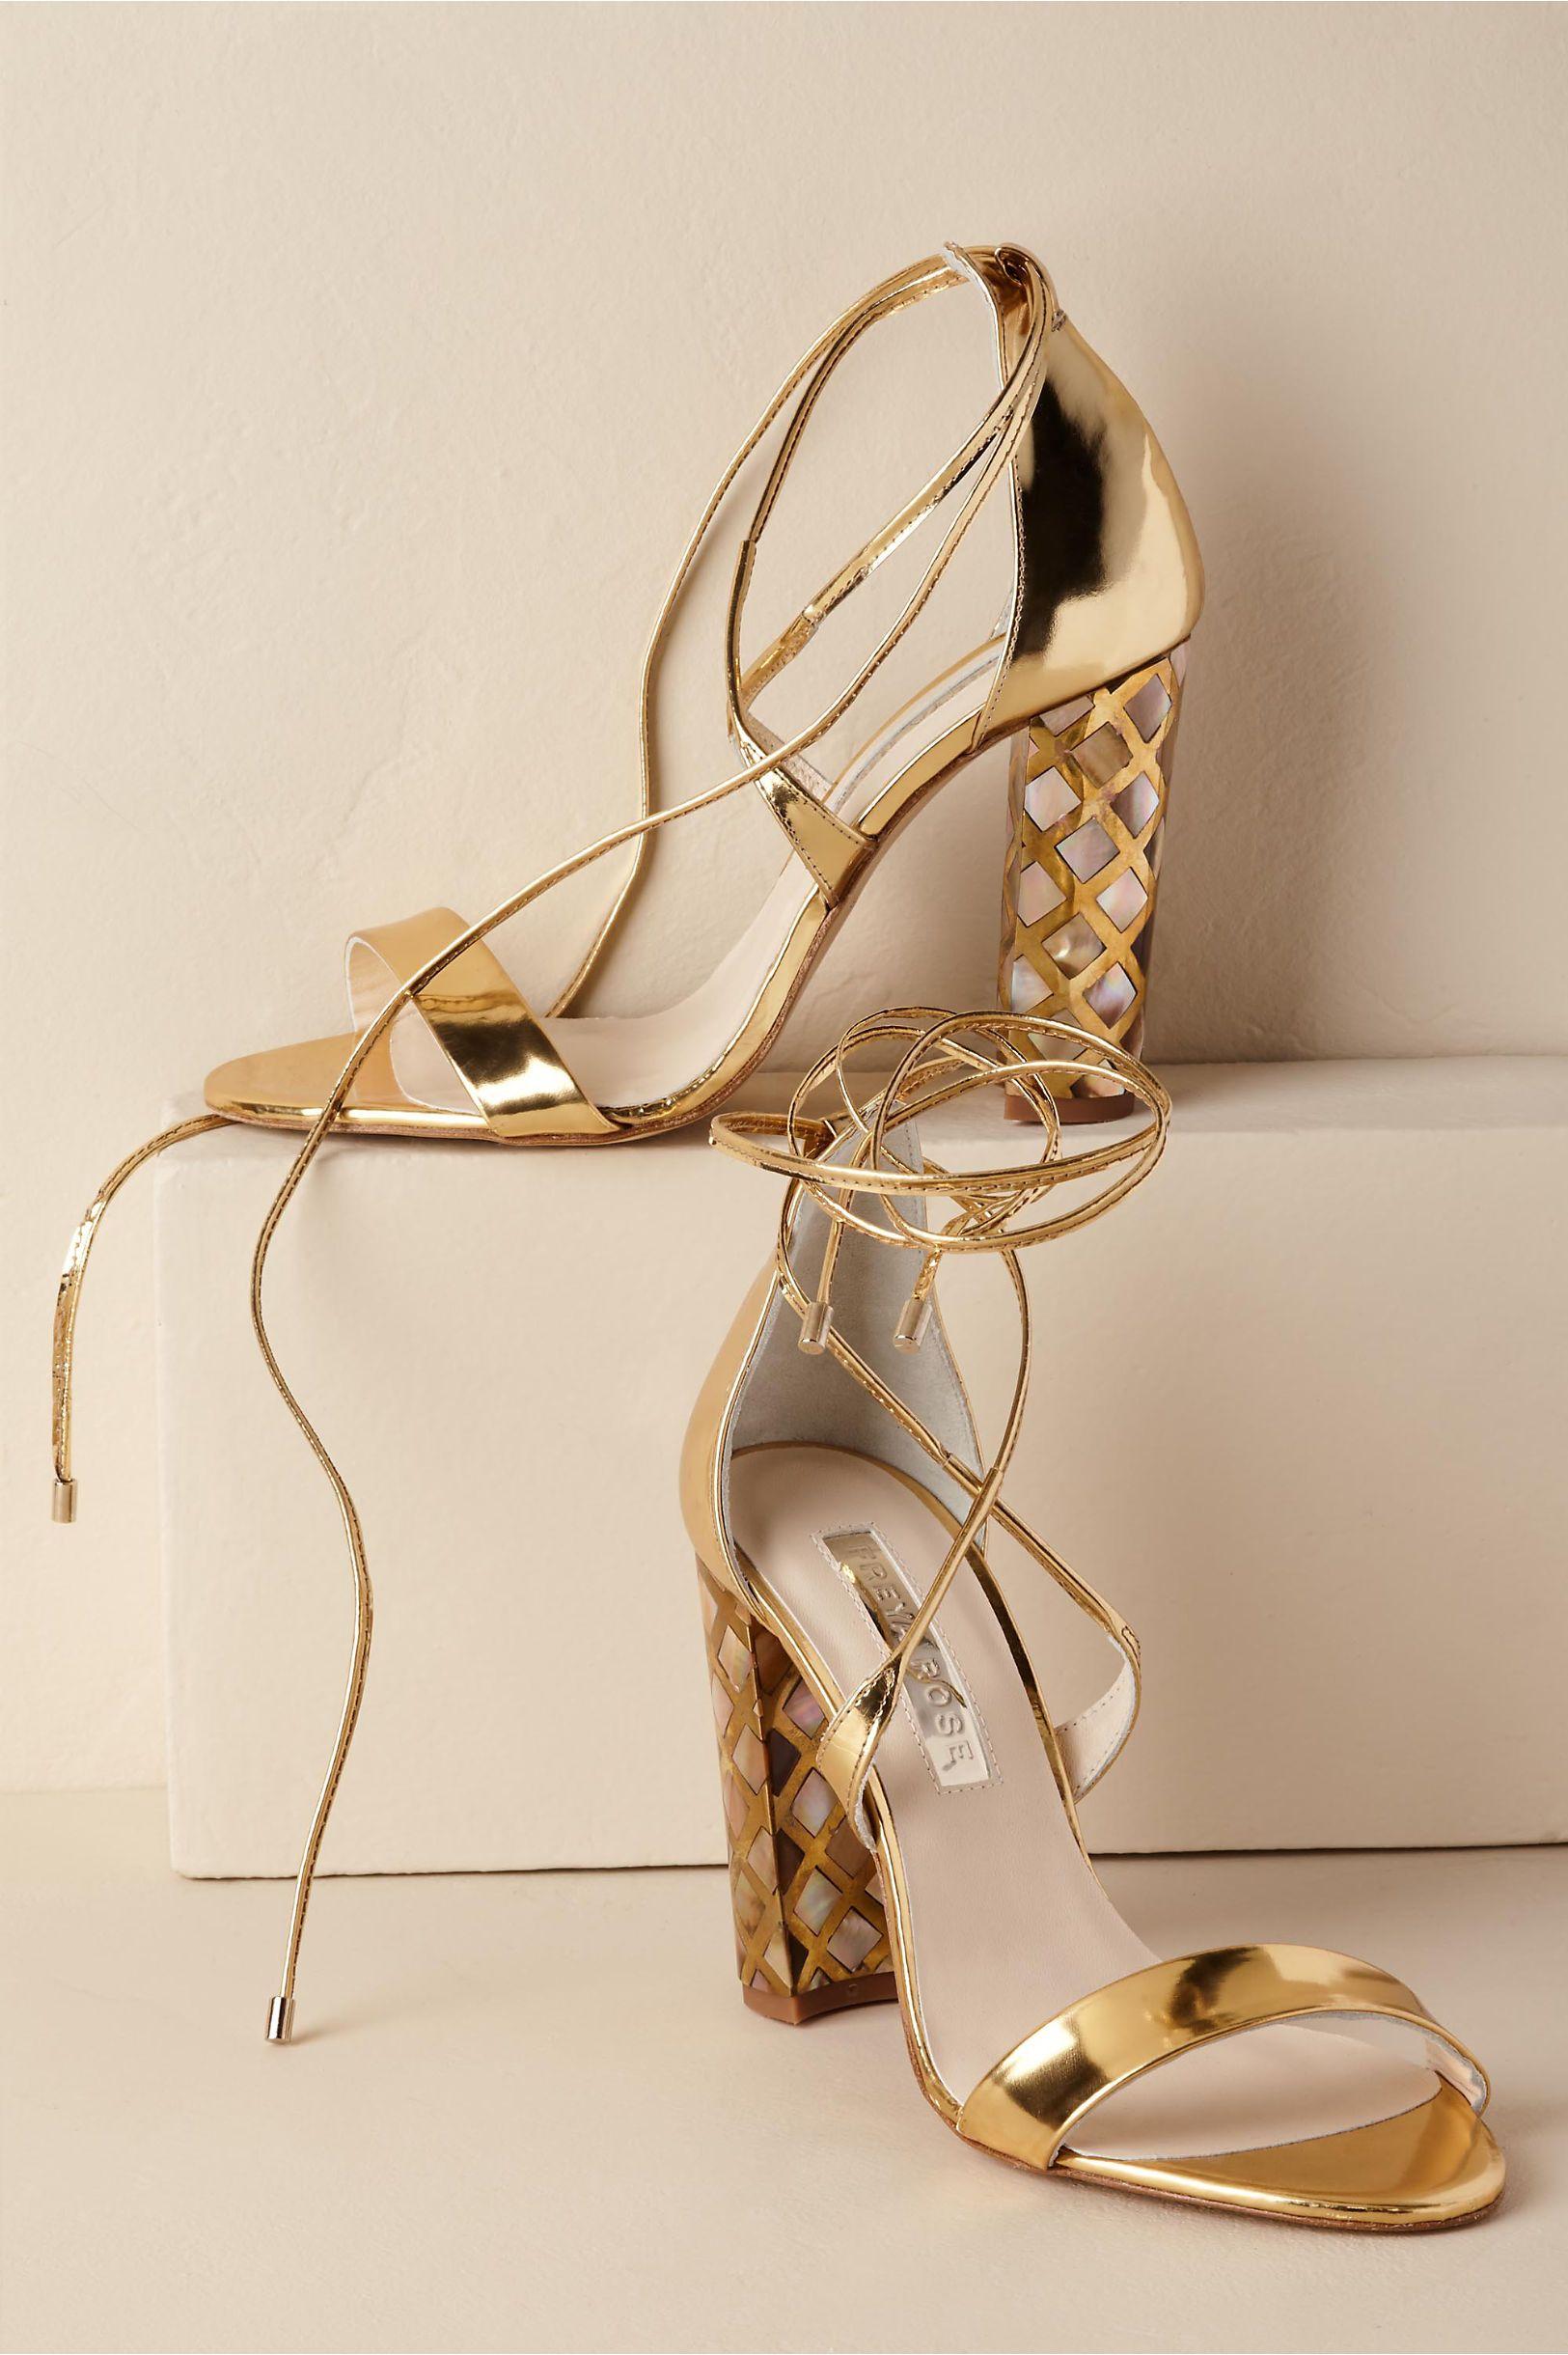 1ebefc3bee1 BHLDN s Freya Rose Courtney Heel in Gold